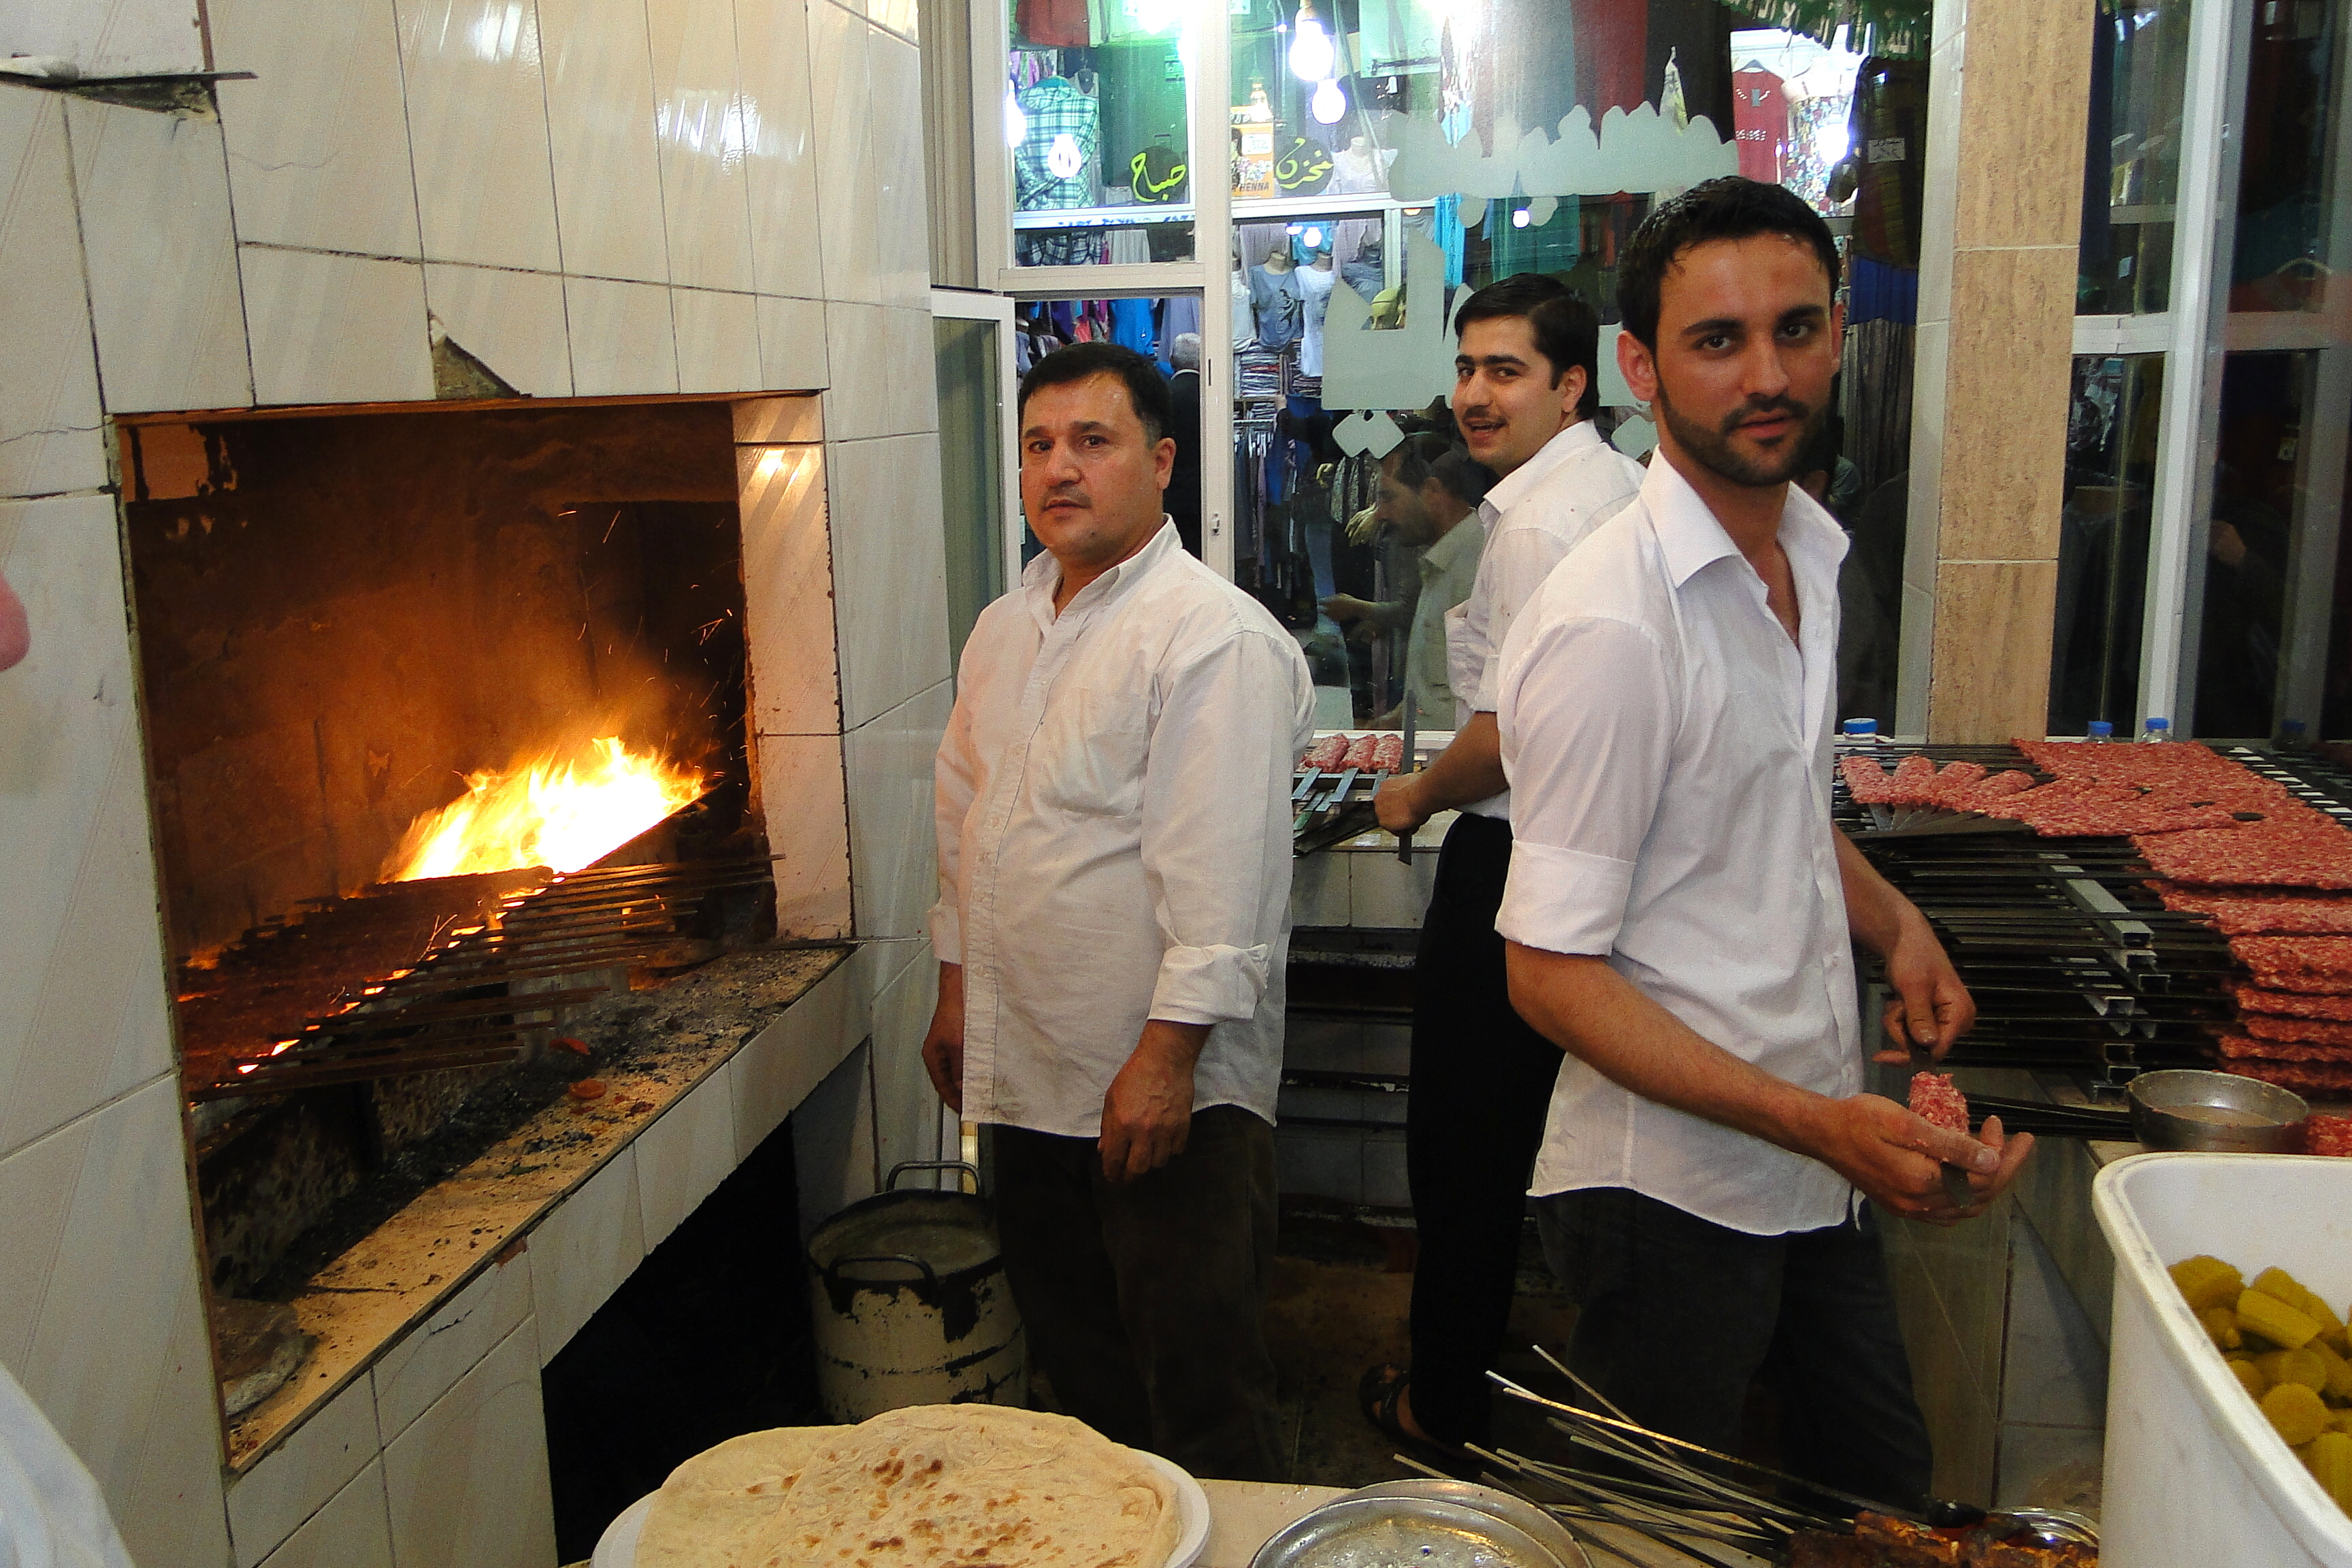 File:Kebab Sellers - Bazaar - Erbil - Iraq.jpg